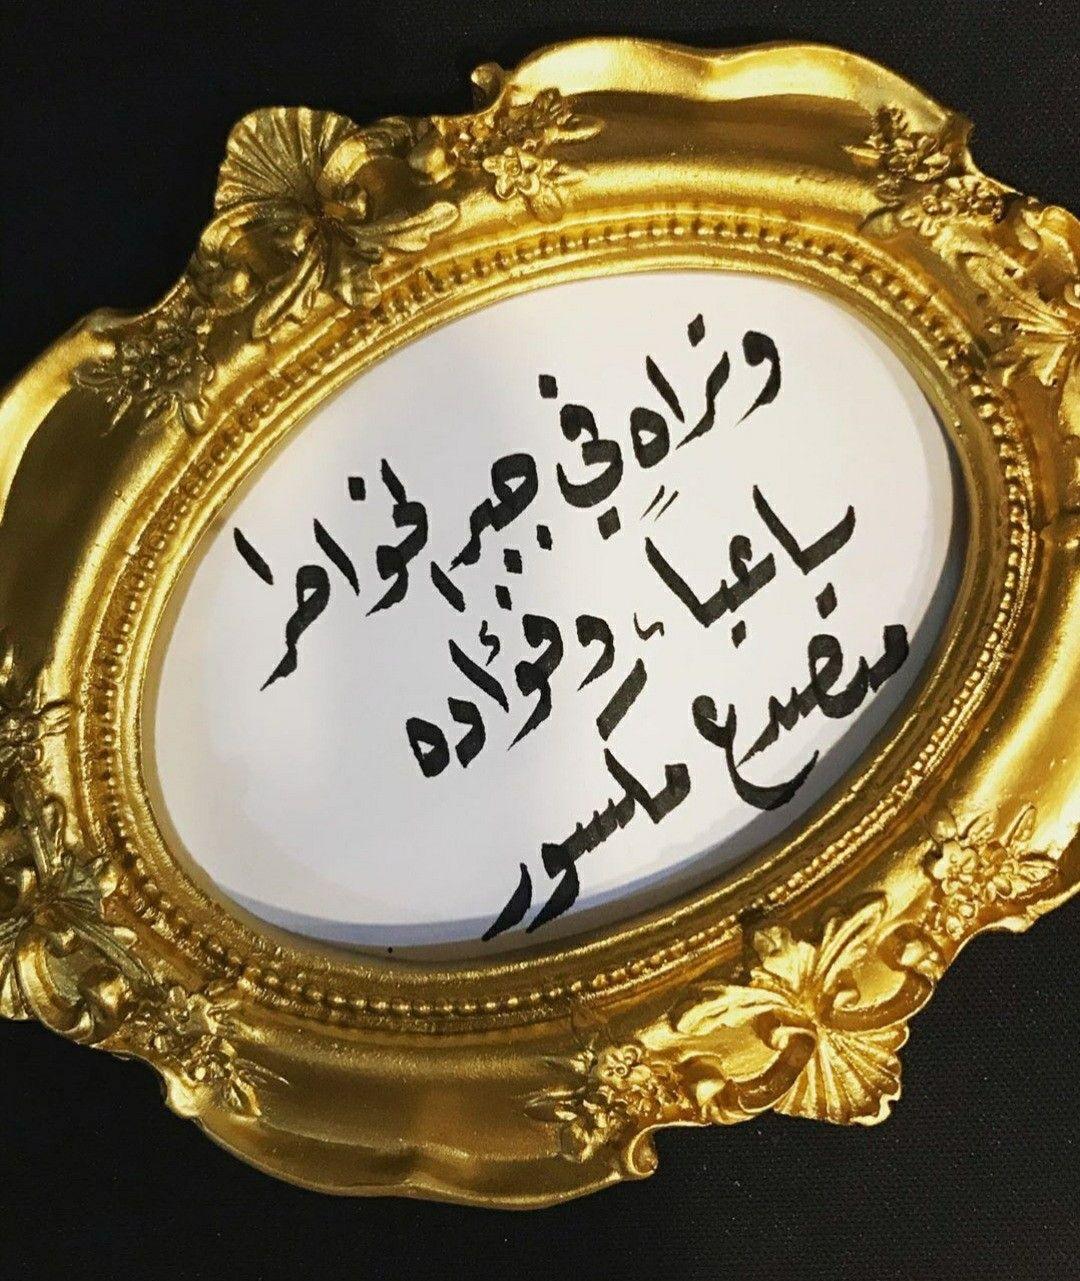 وتراه في جبر الخواطر ساعيا وفؤاده متصدع مكسور Dad Drawing Arabic Words Arabic Quotes